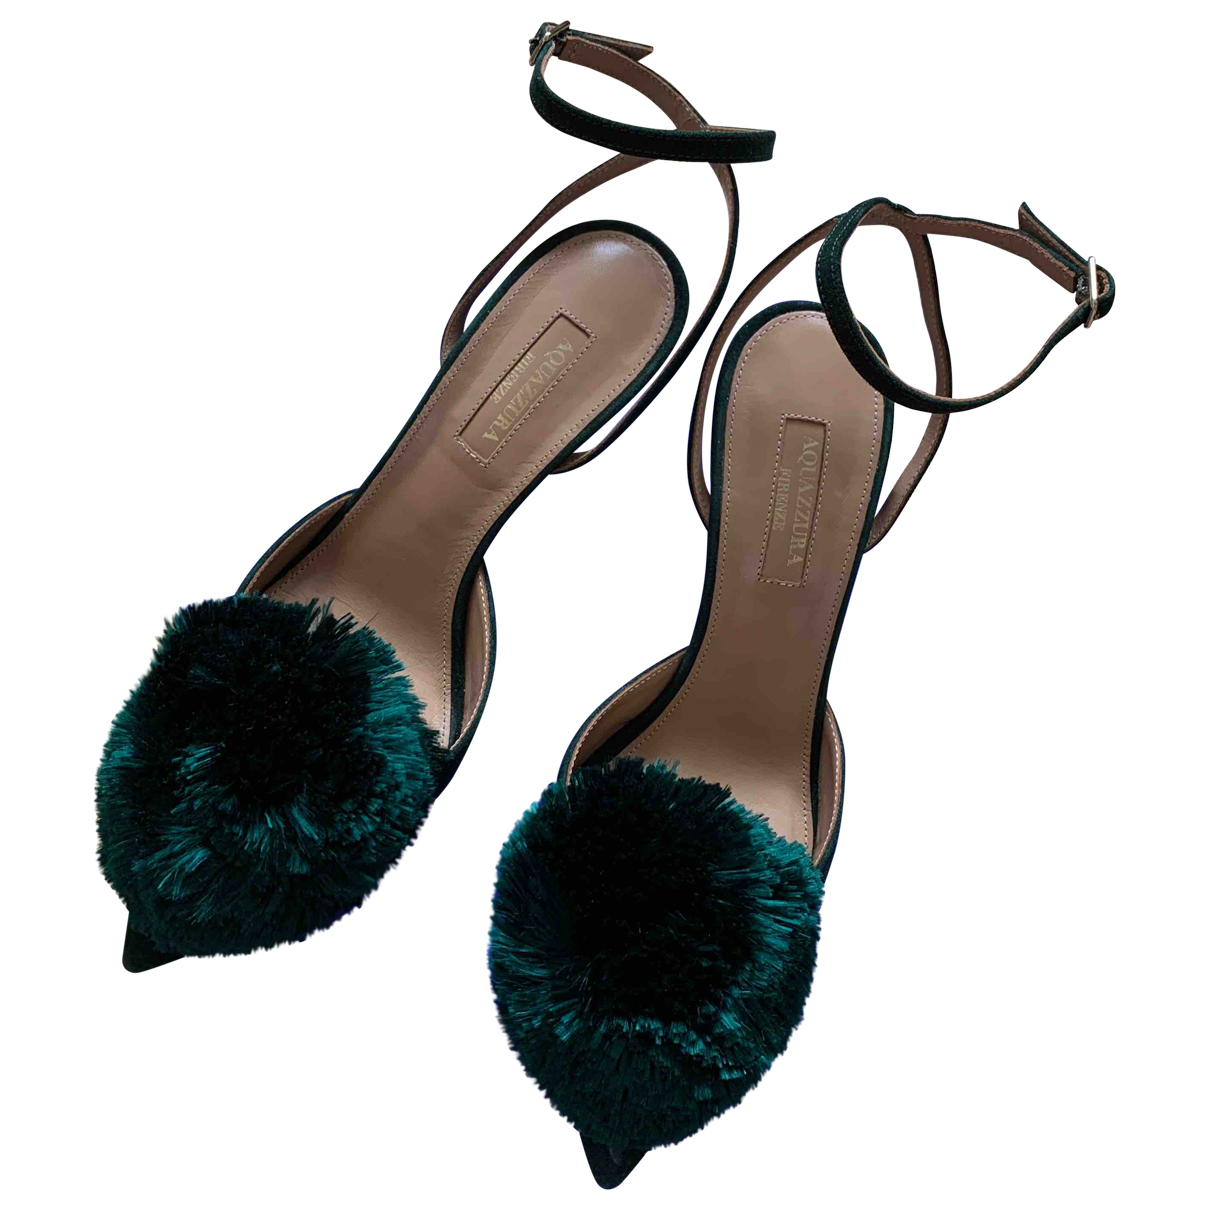 Aquazzura \N Green Suede Sandals for Women 36 EU